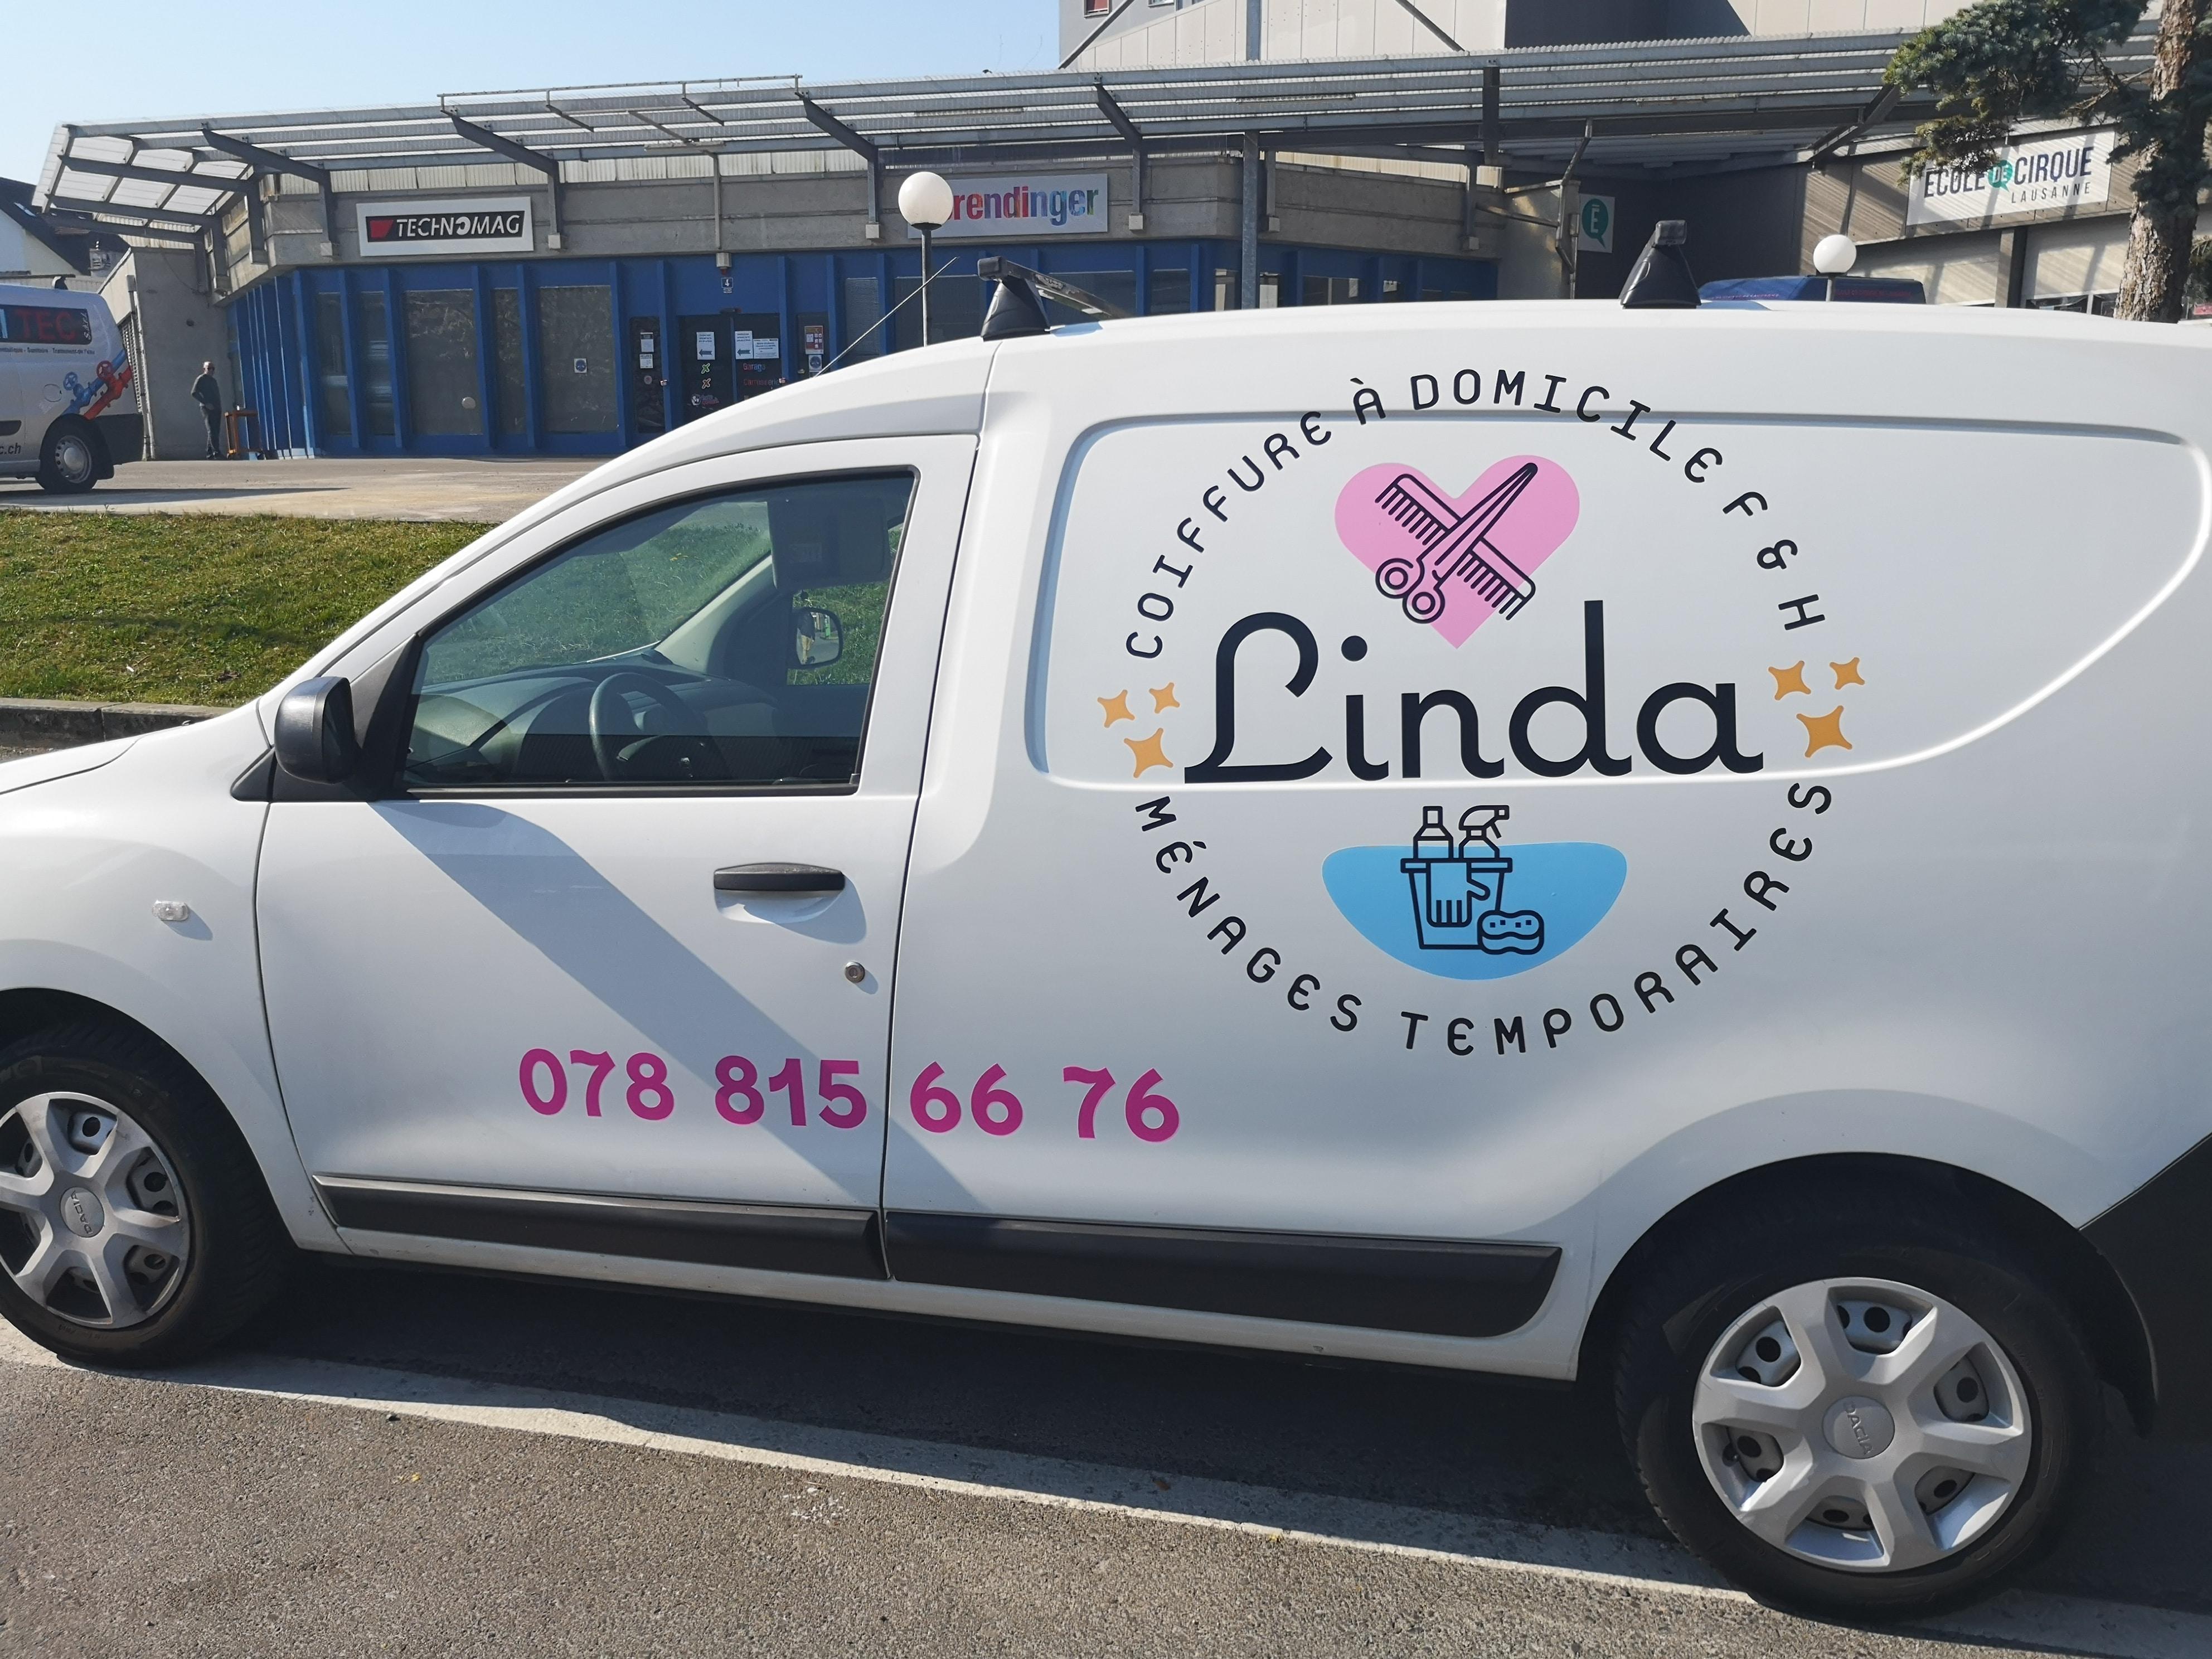 Linda Coiffure - Logo et flocage de véhicule - Haymoz design